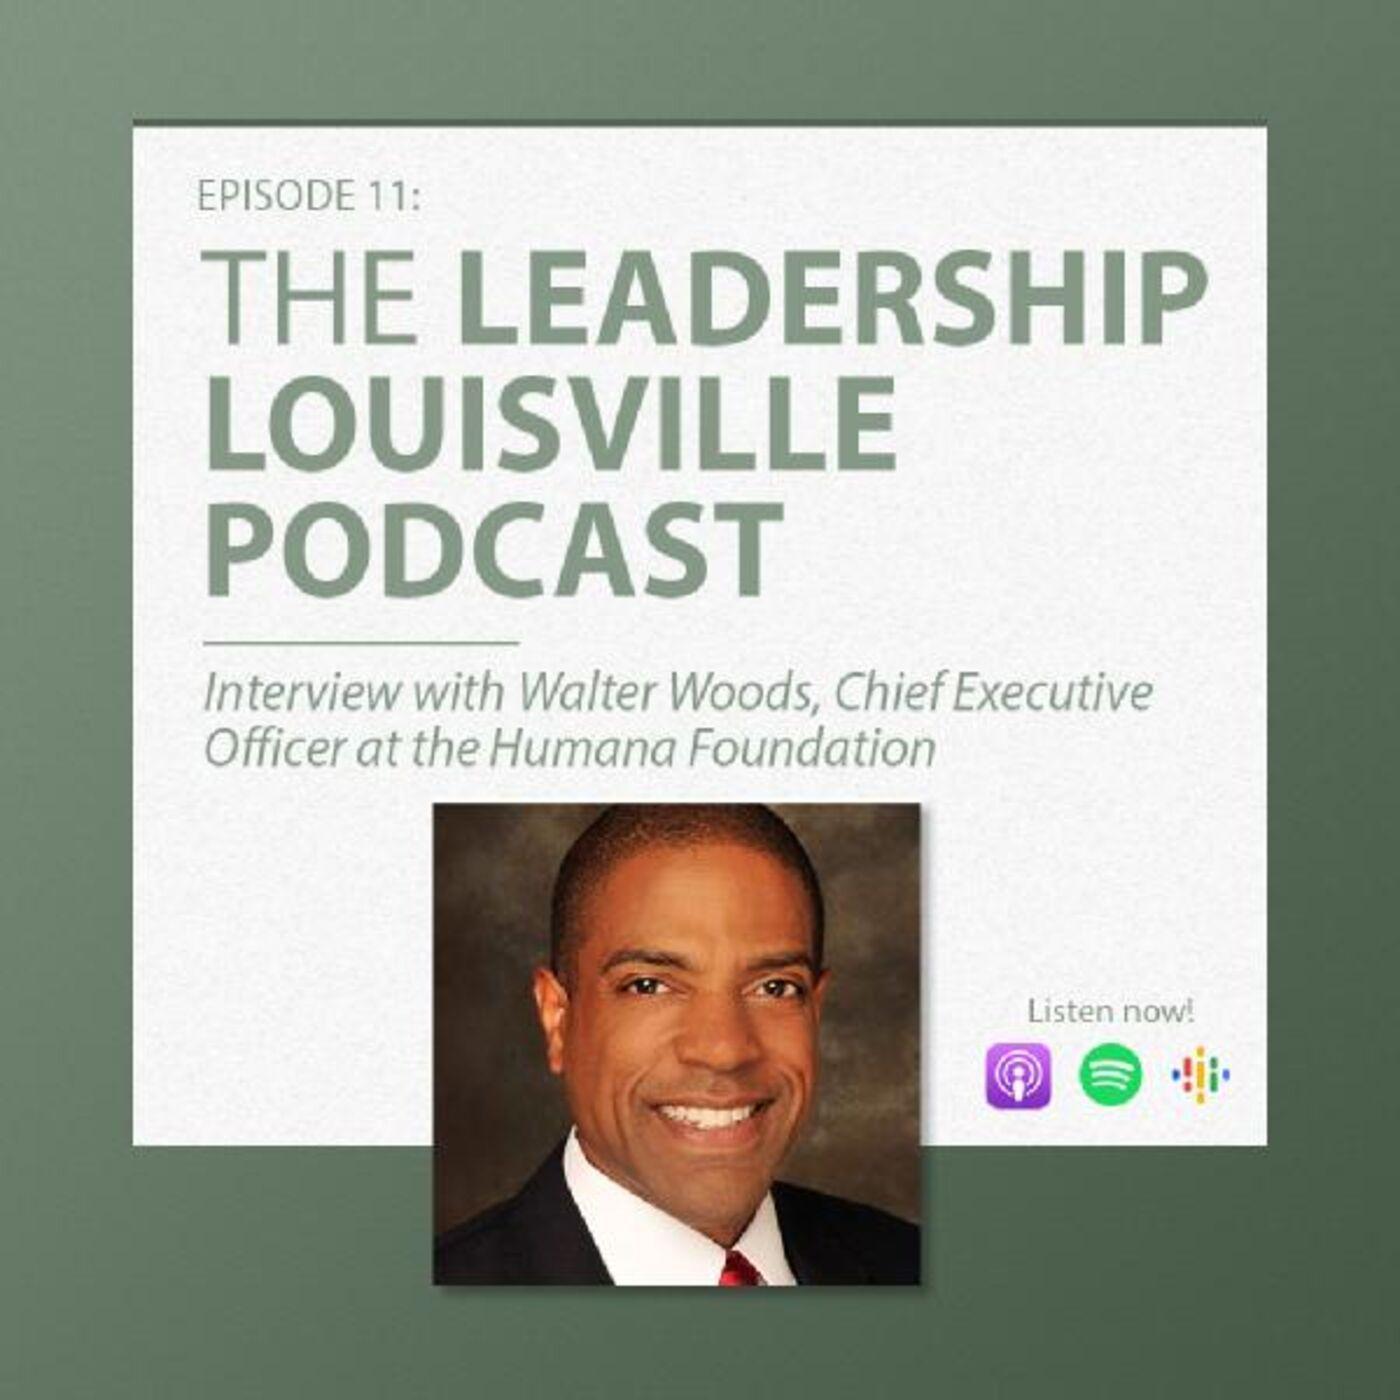 Walter Woods, CEO, Humana Foundation